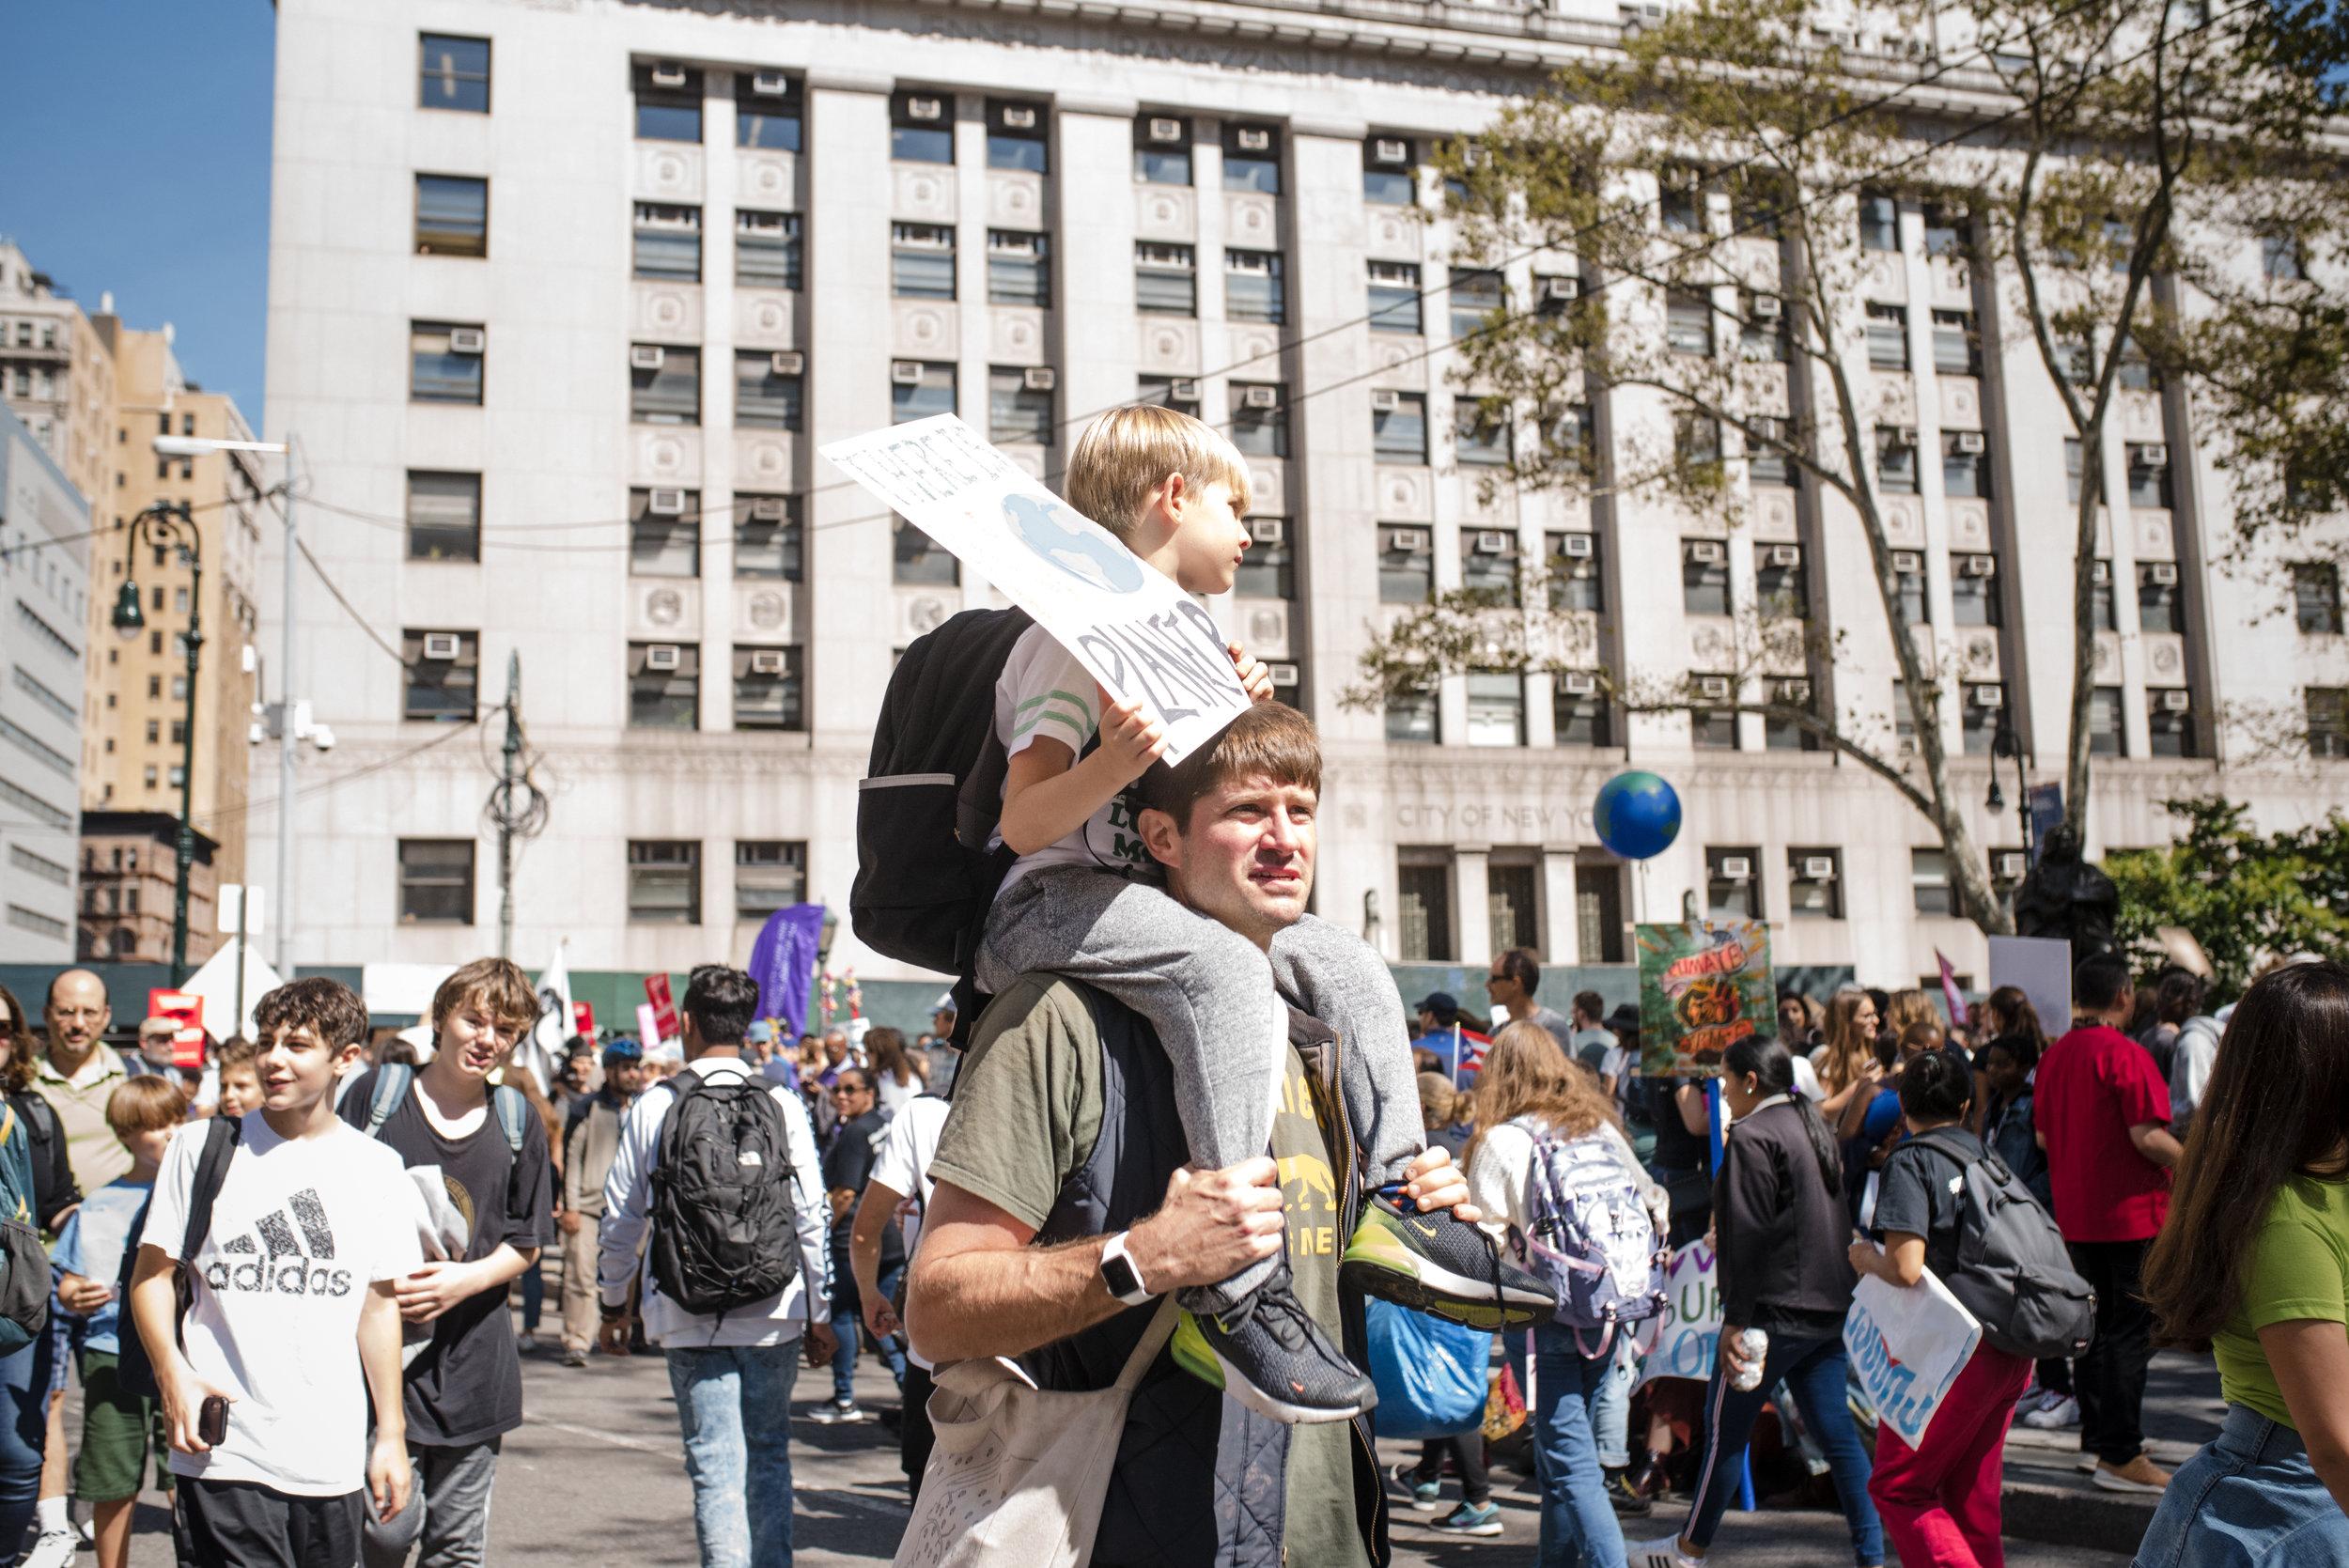 Michelle Kinney Photography - Climate Strike NYC -16.jpg